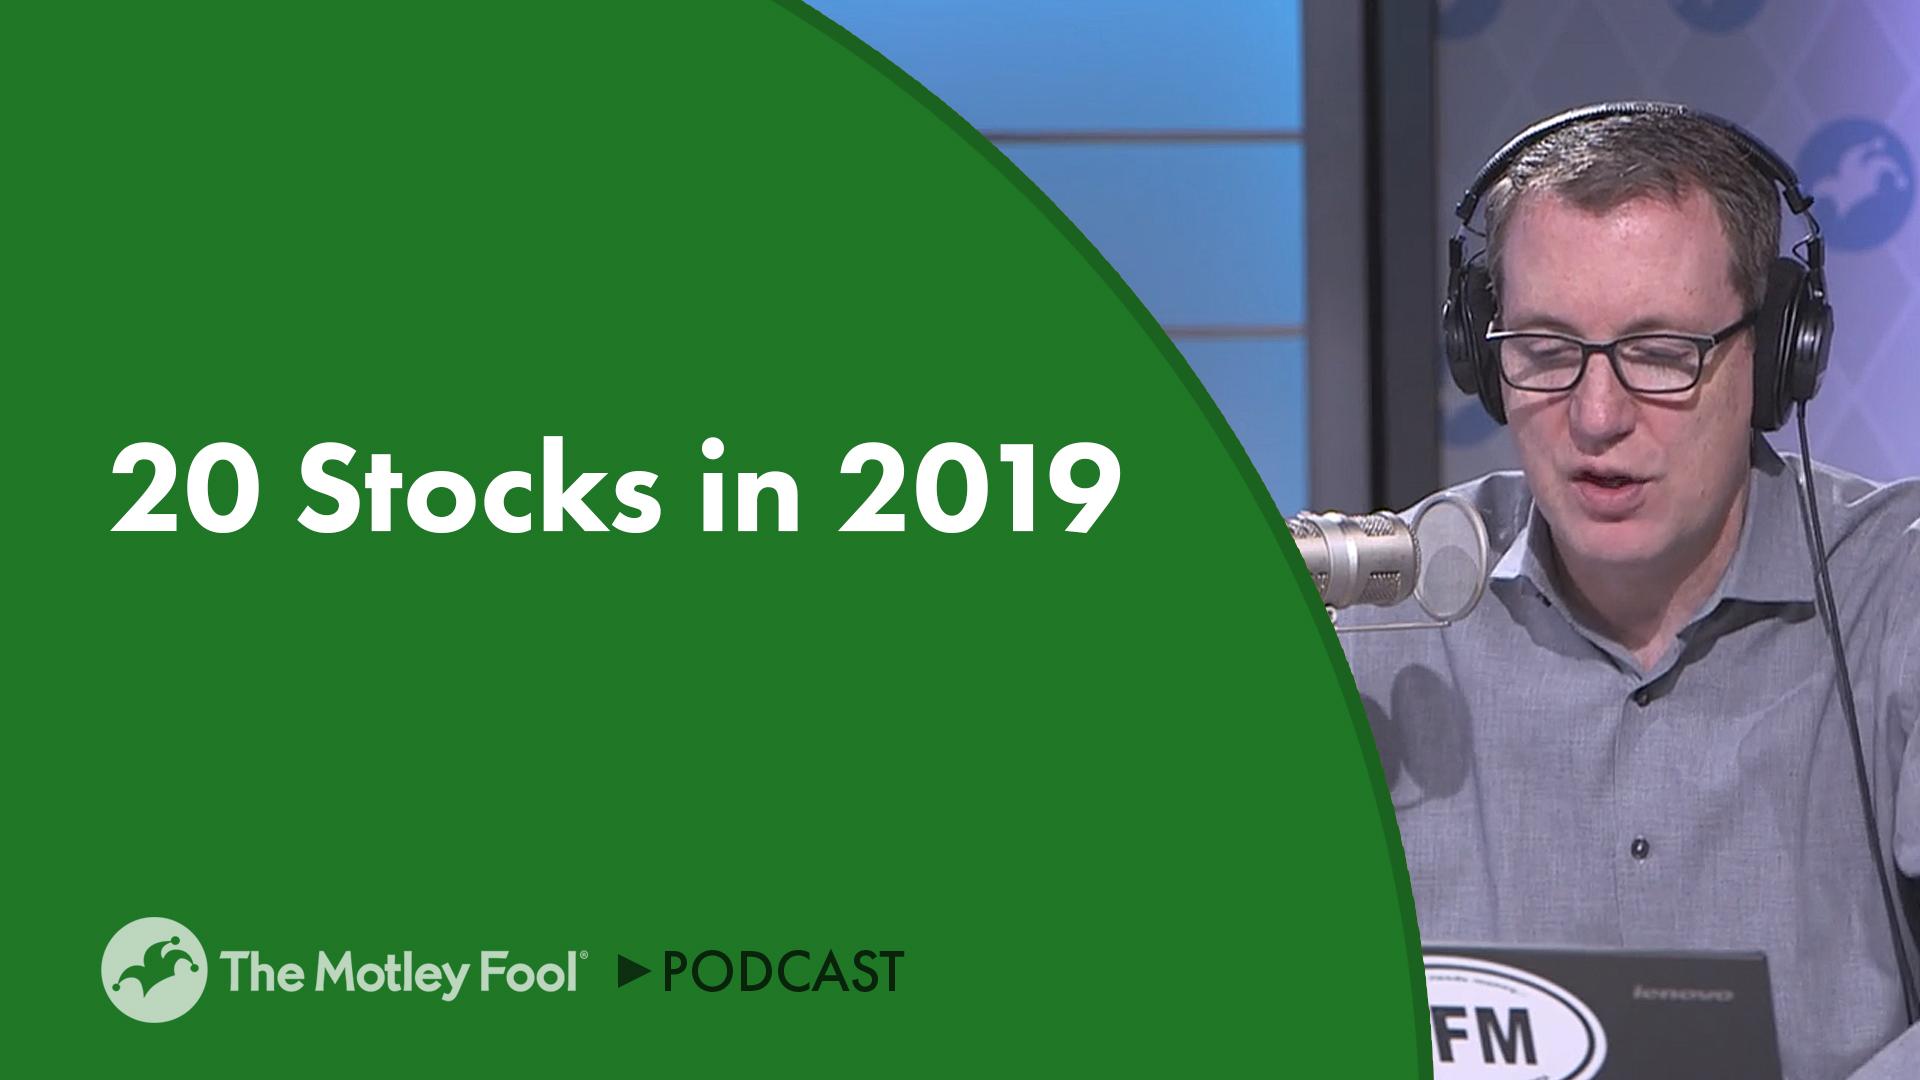 20 Stocks in 2019 -- The Motley Fool